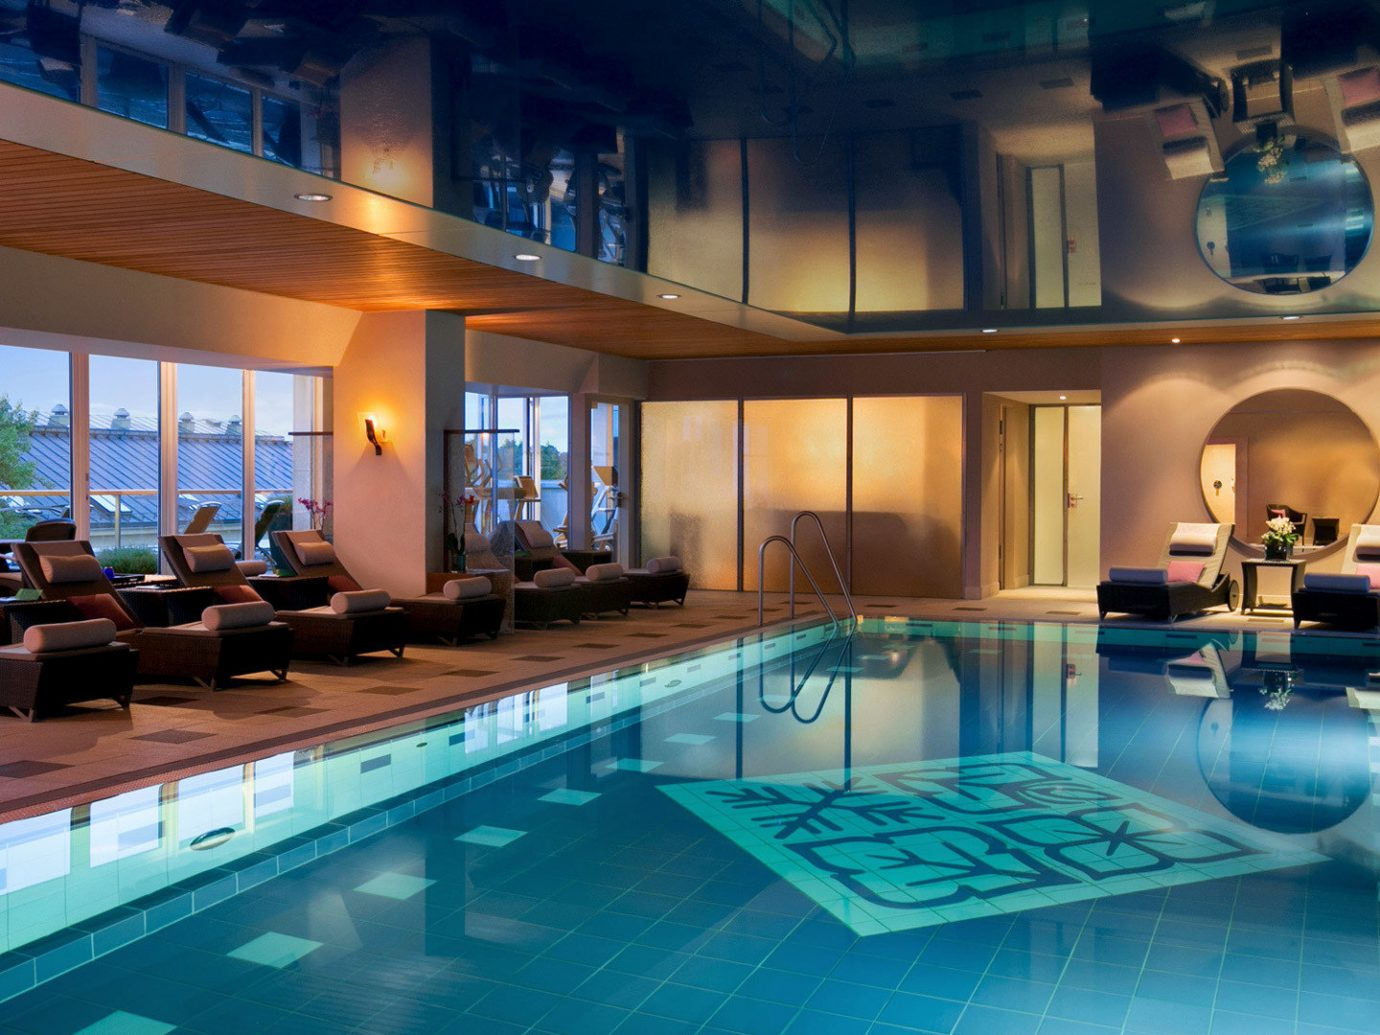 europe Germany Hotels Munich indoor swimming pool window property leisure Resort room estate billiard room interior design mansion blue